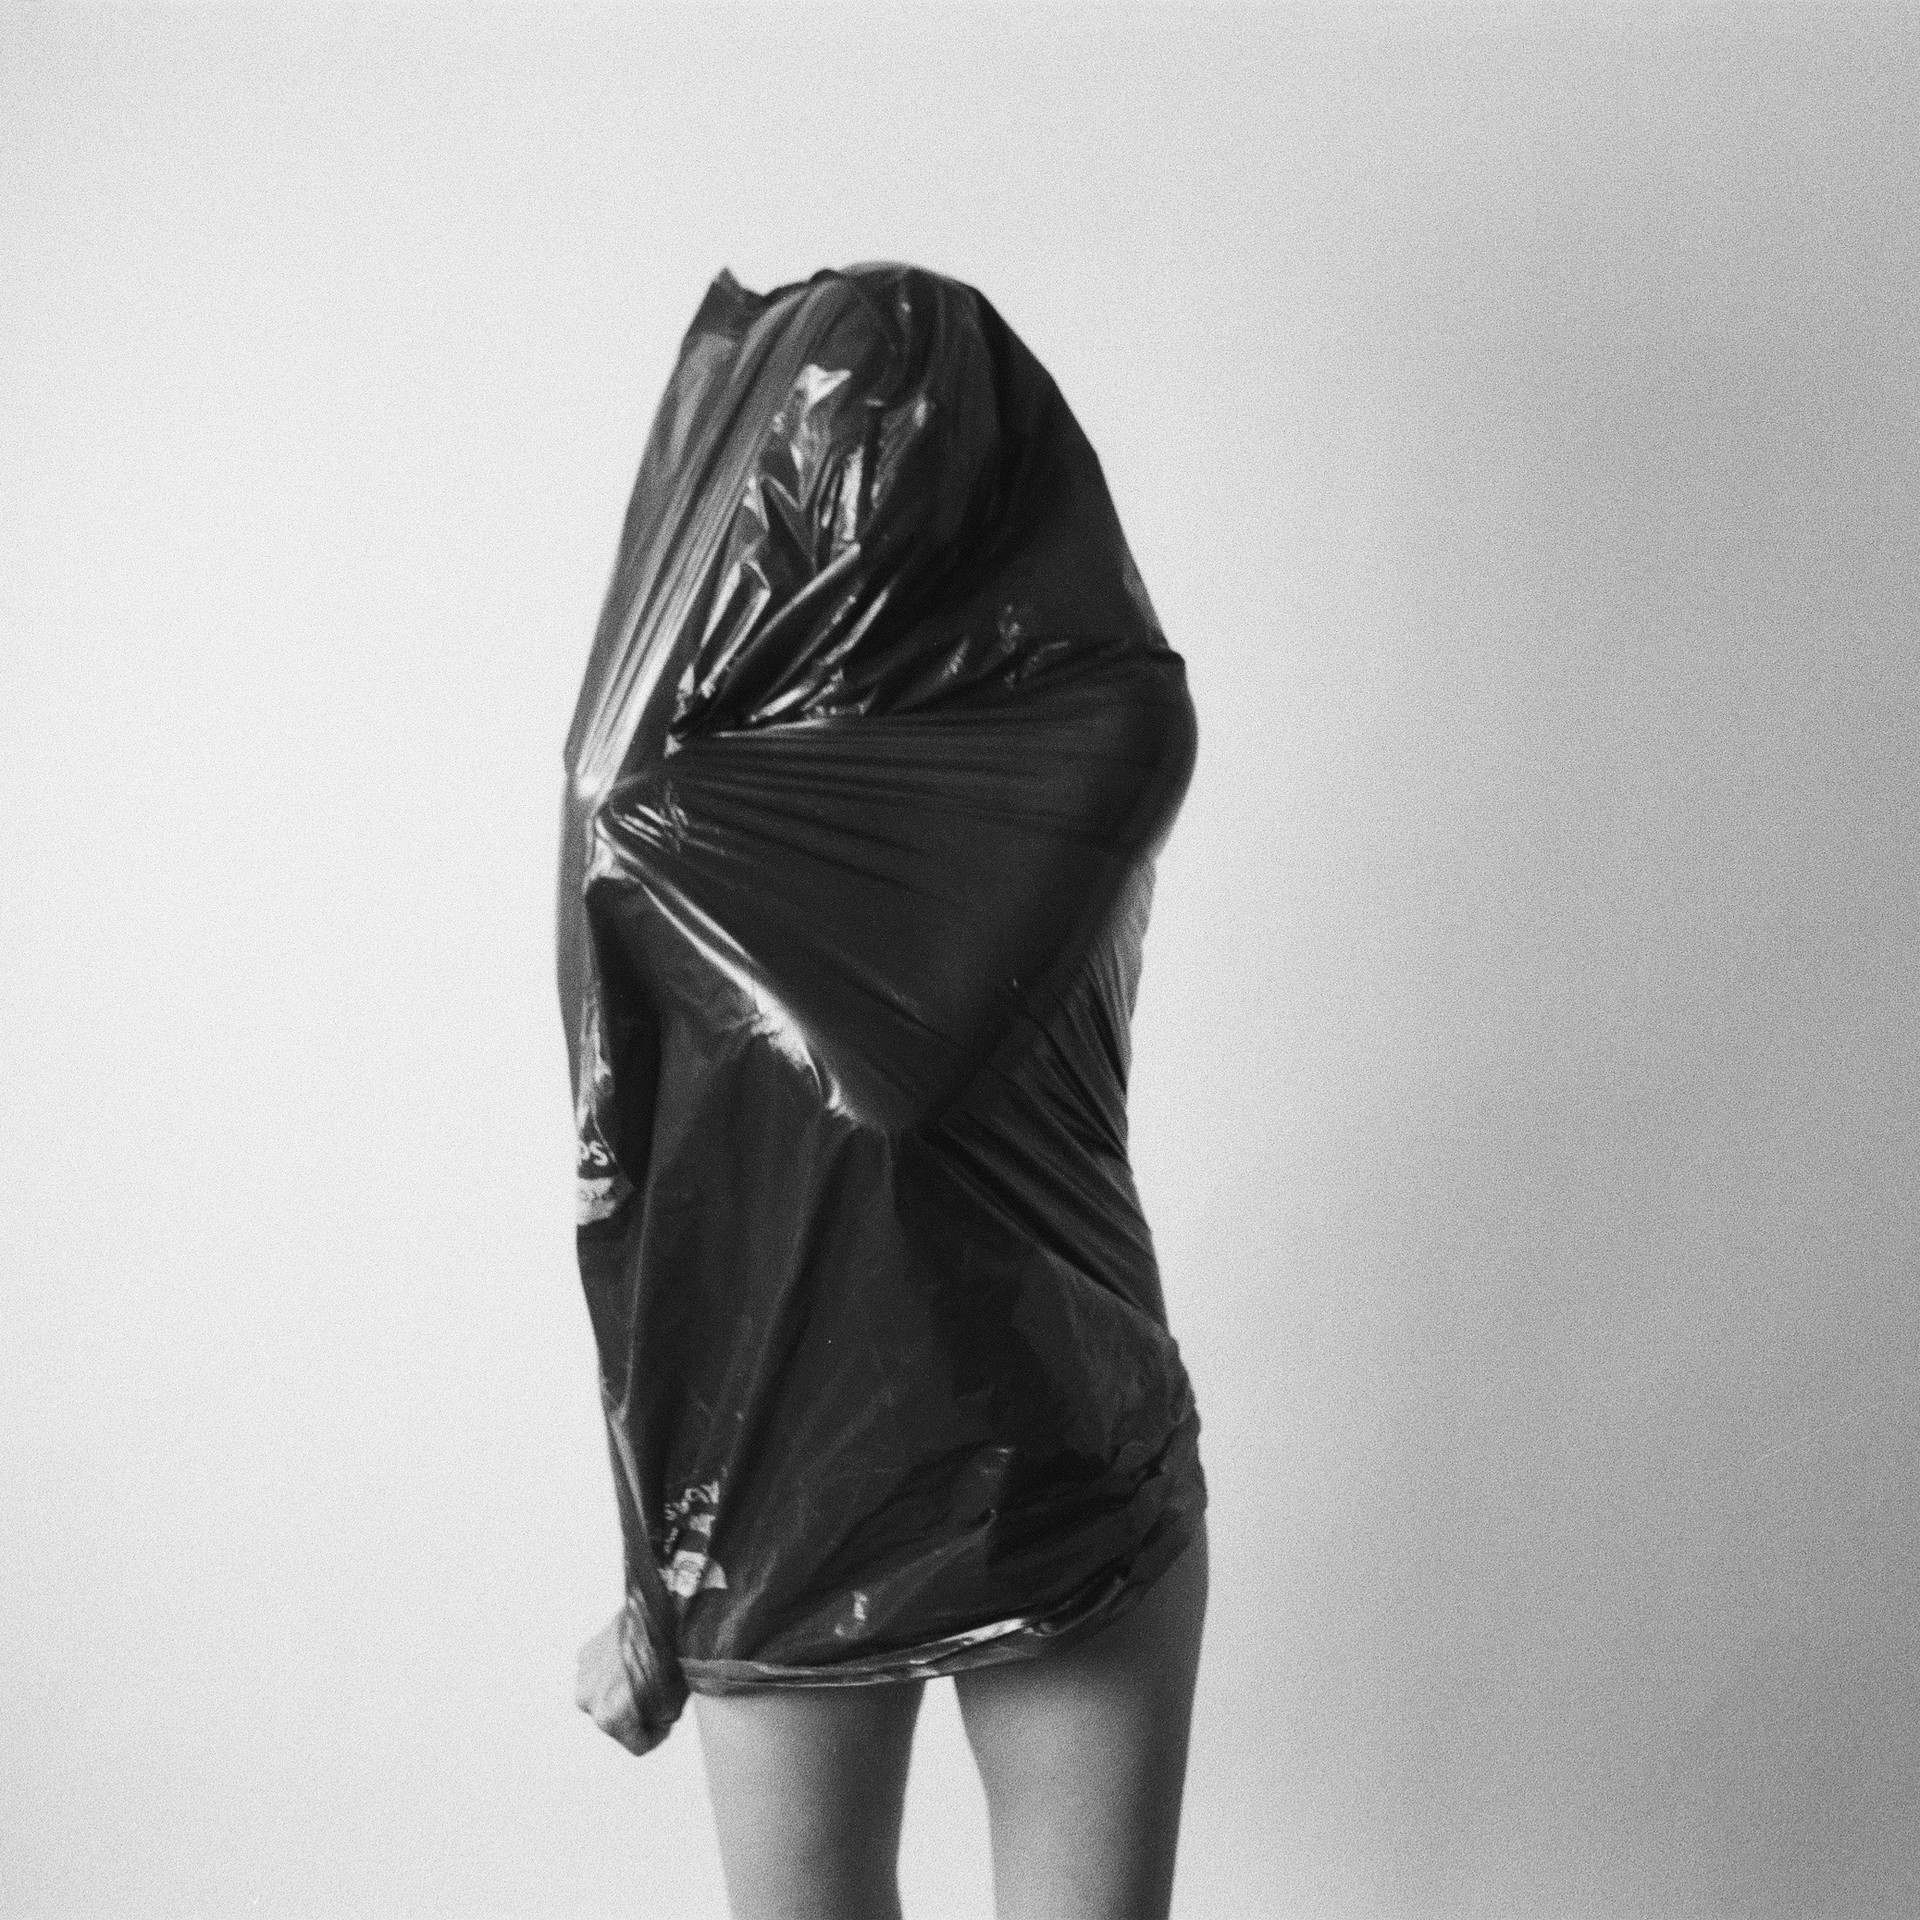 untitled from the series breath. 2020. gelatin silver print. copyright soli kiani